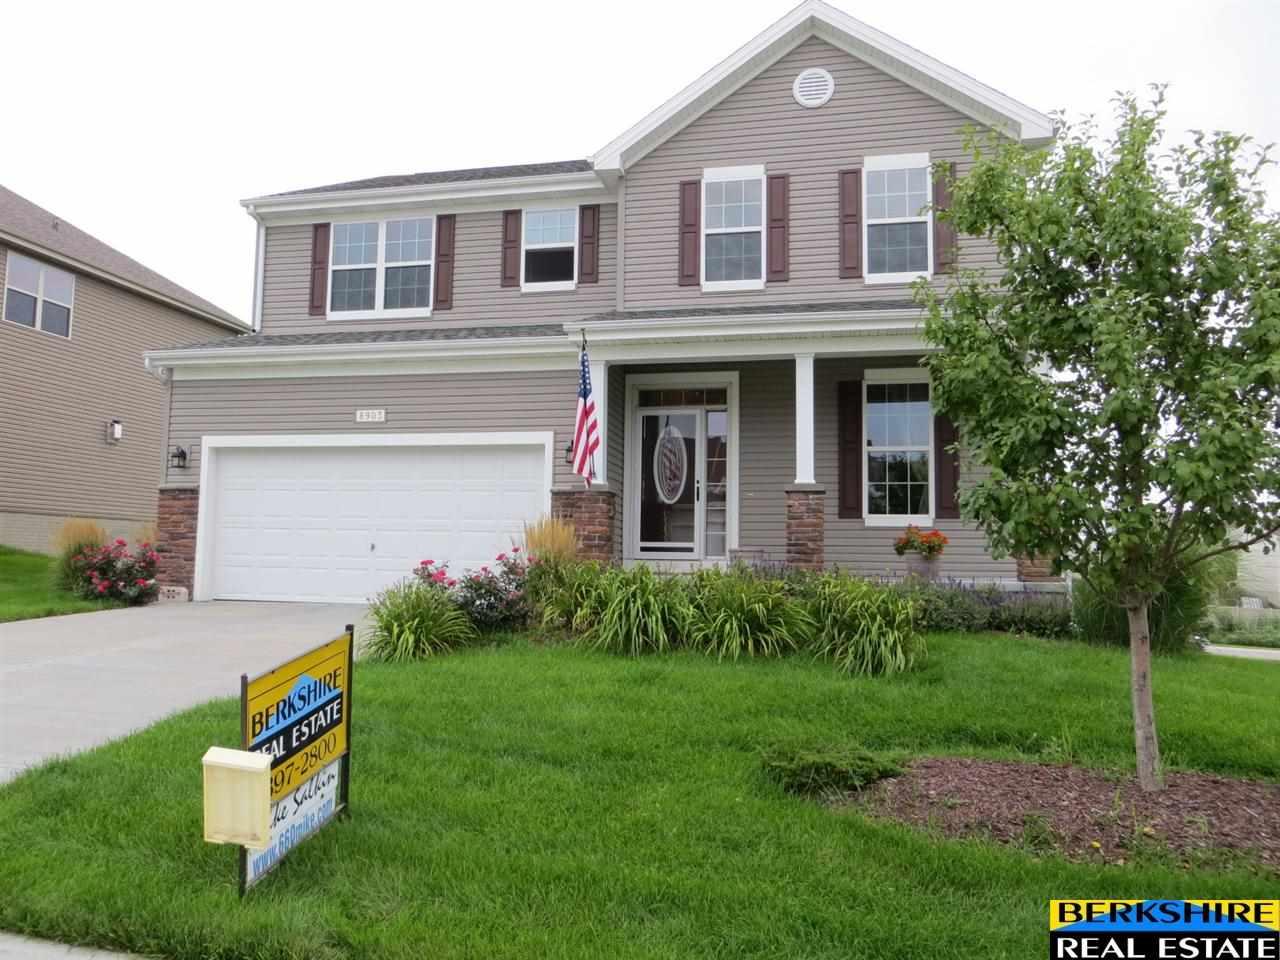 Real Estate for Sale, ListingId: 29552106, Bennington,NE68007